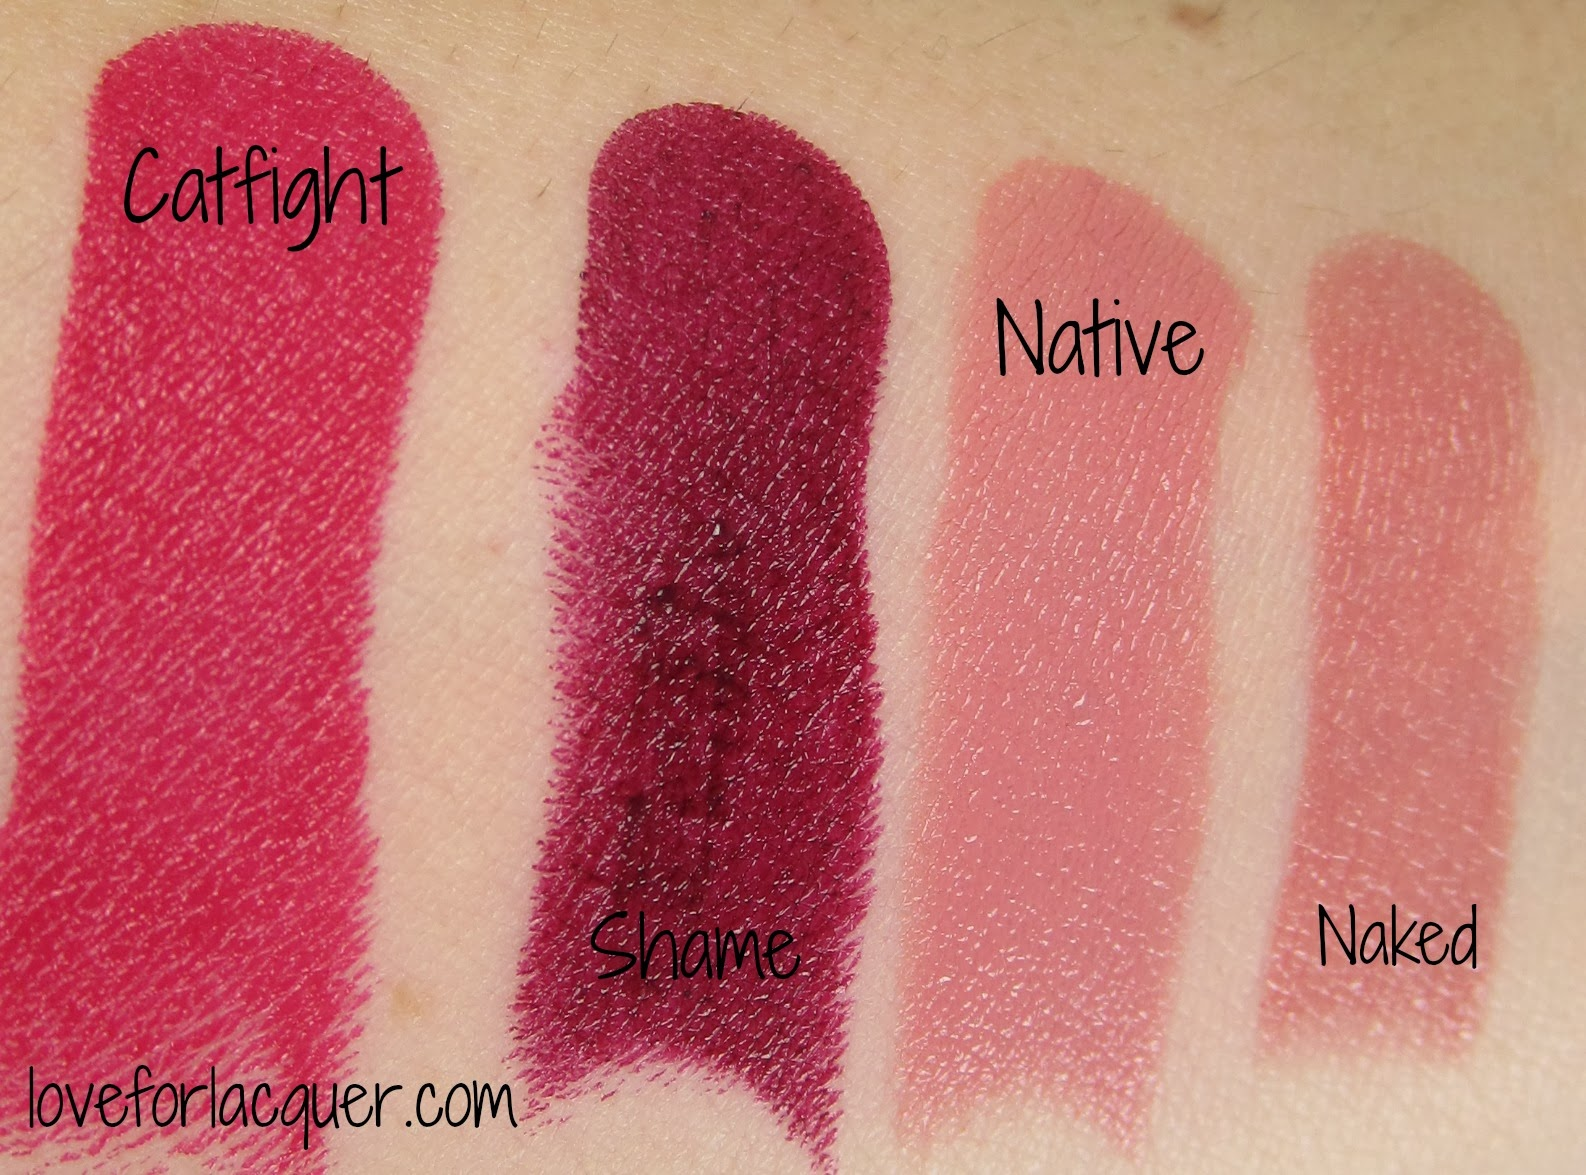 Revolution Lipstick by Urban Decay #18